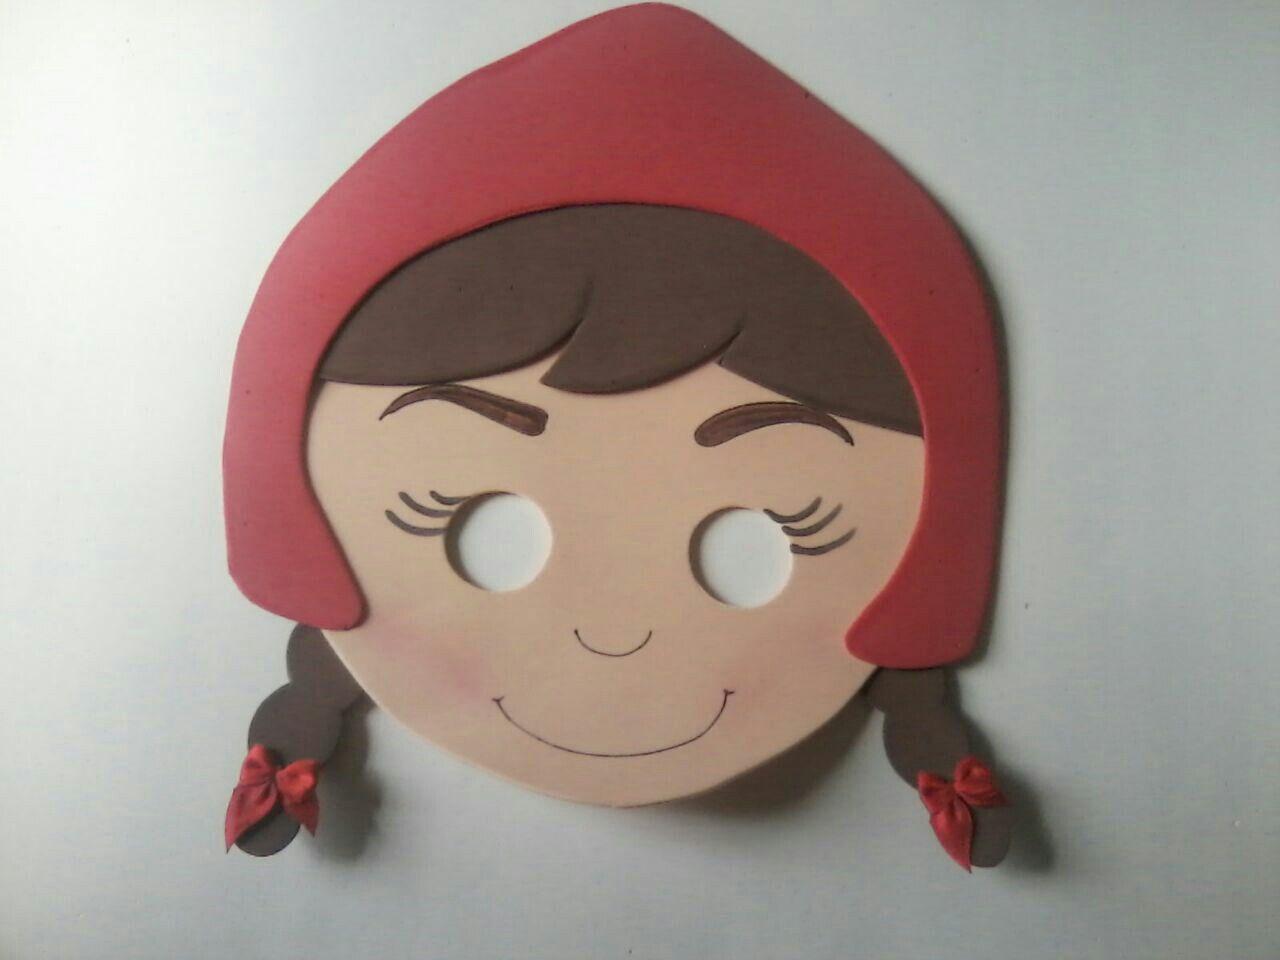 Máscara Chapeuzinho Vermelho Manualidades Para Niños Patrones De Fieltro Caperucita Roja